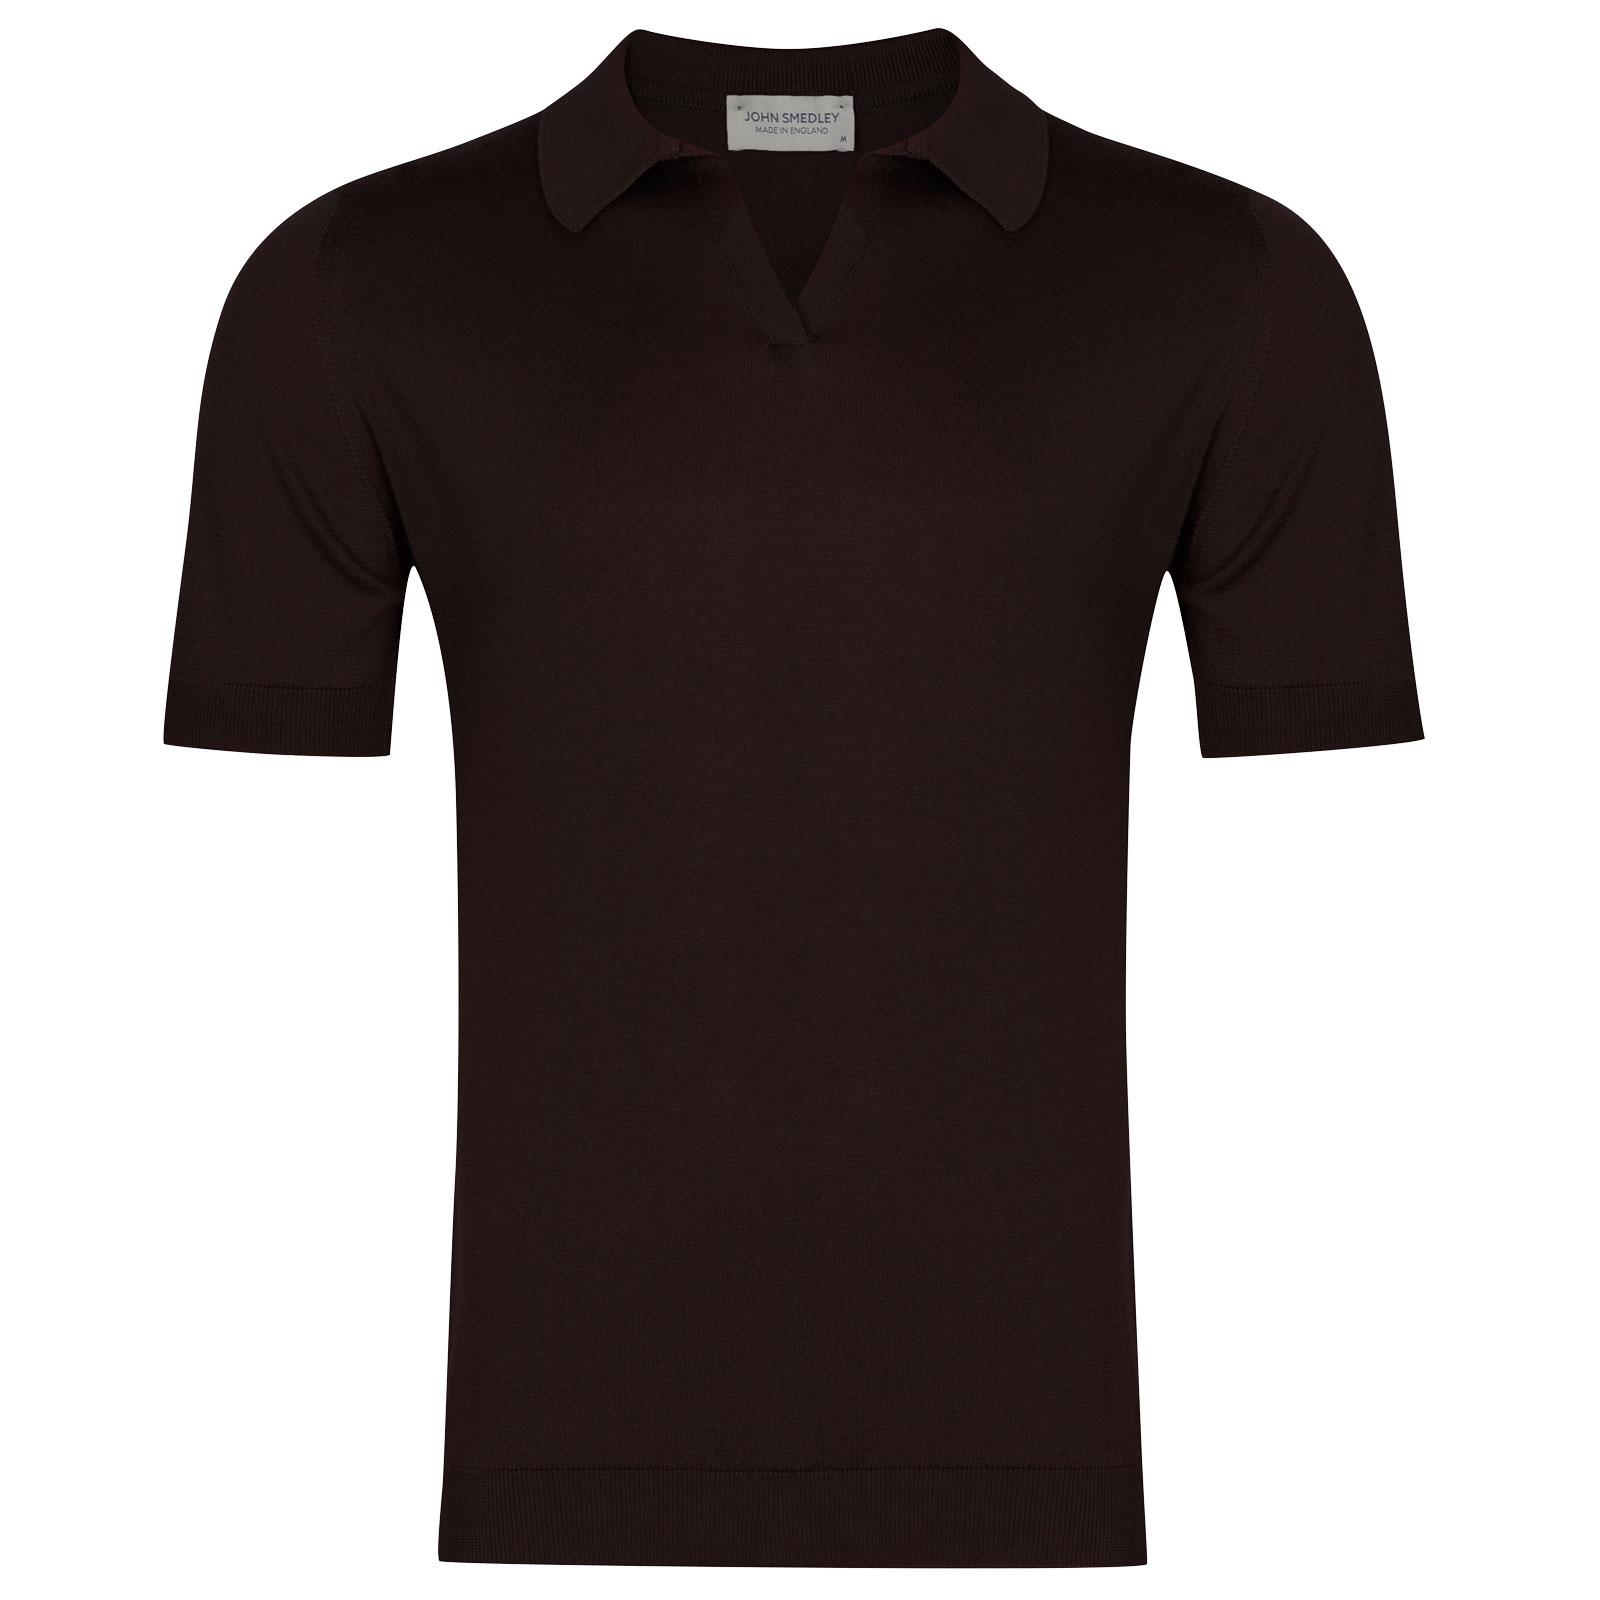 John Smedley Ancona in Dark Leather Shirt-SML